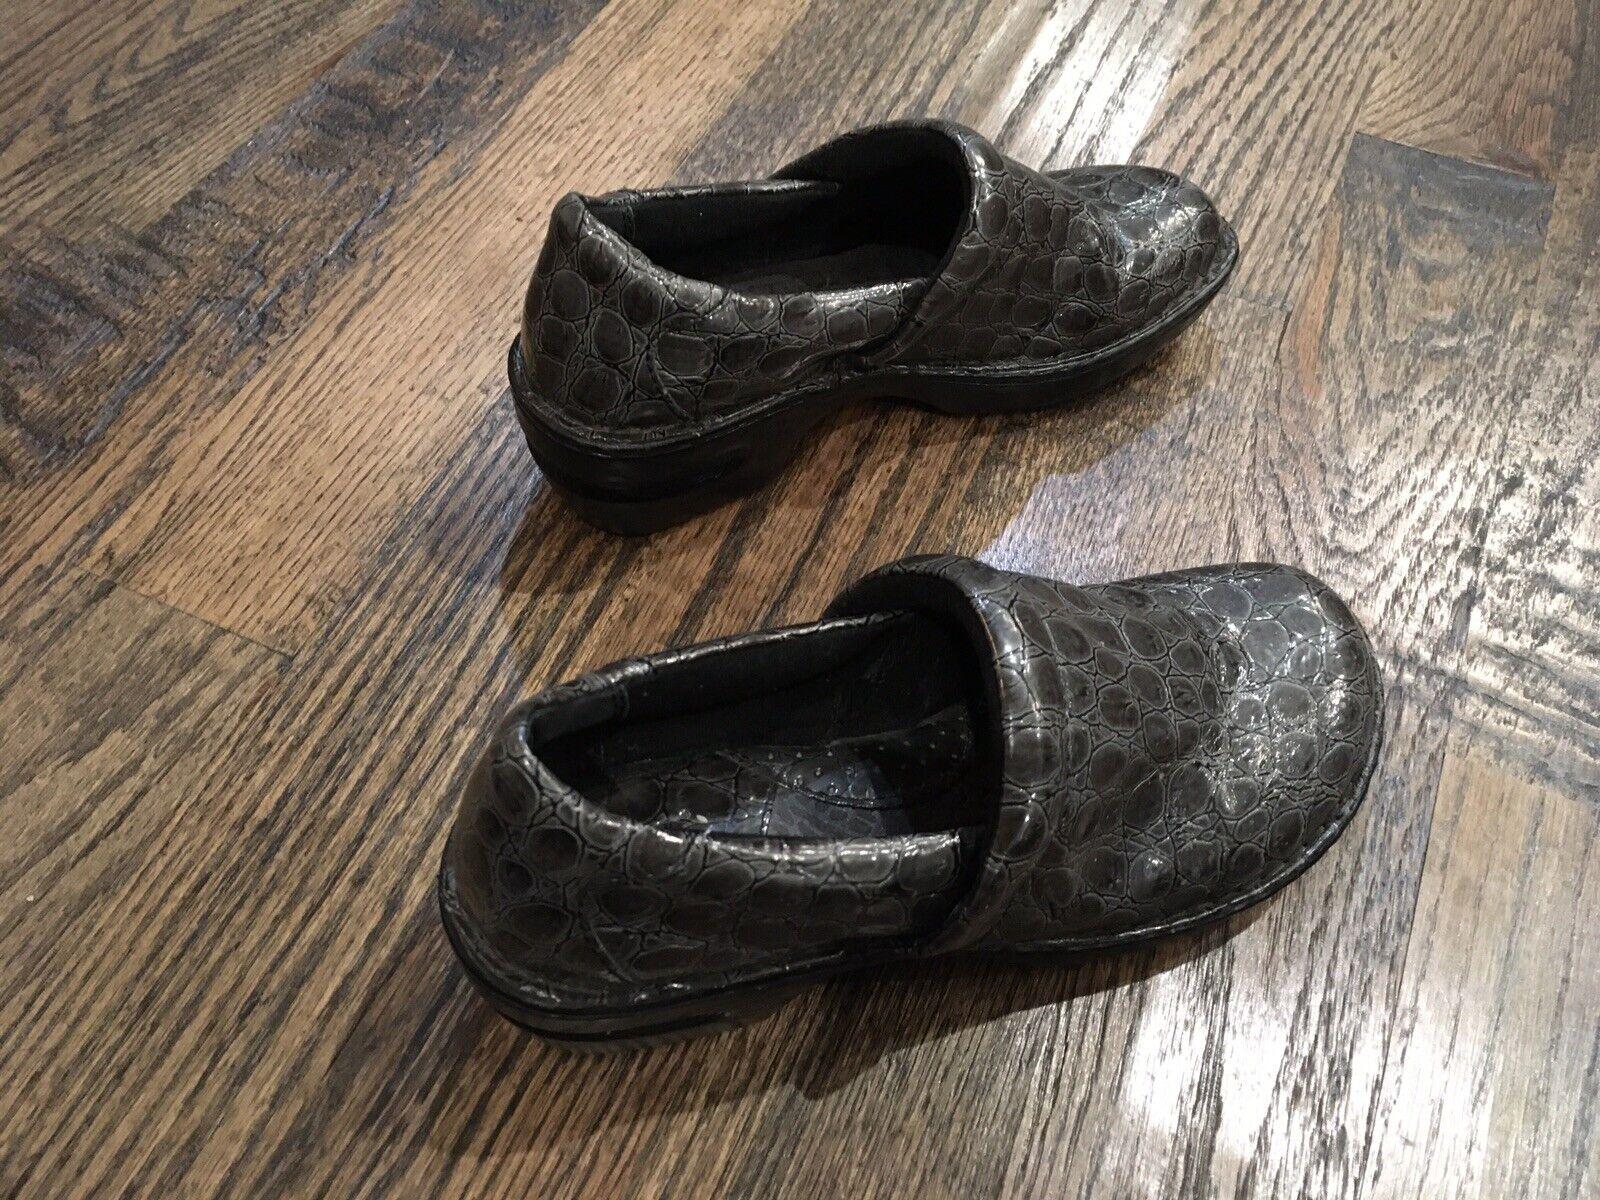 B.O.C. BOC Born Nurse Doctor Clogs Sz 9M Gray Faux Crocodile Print Comfort Shoe